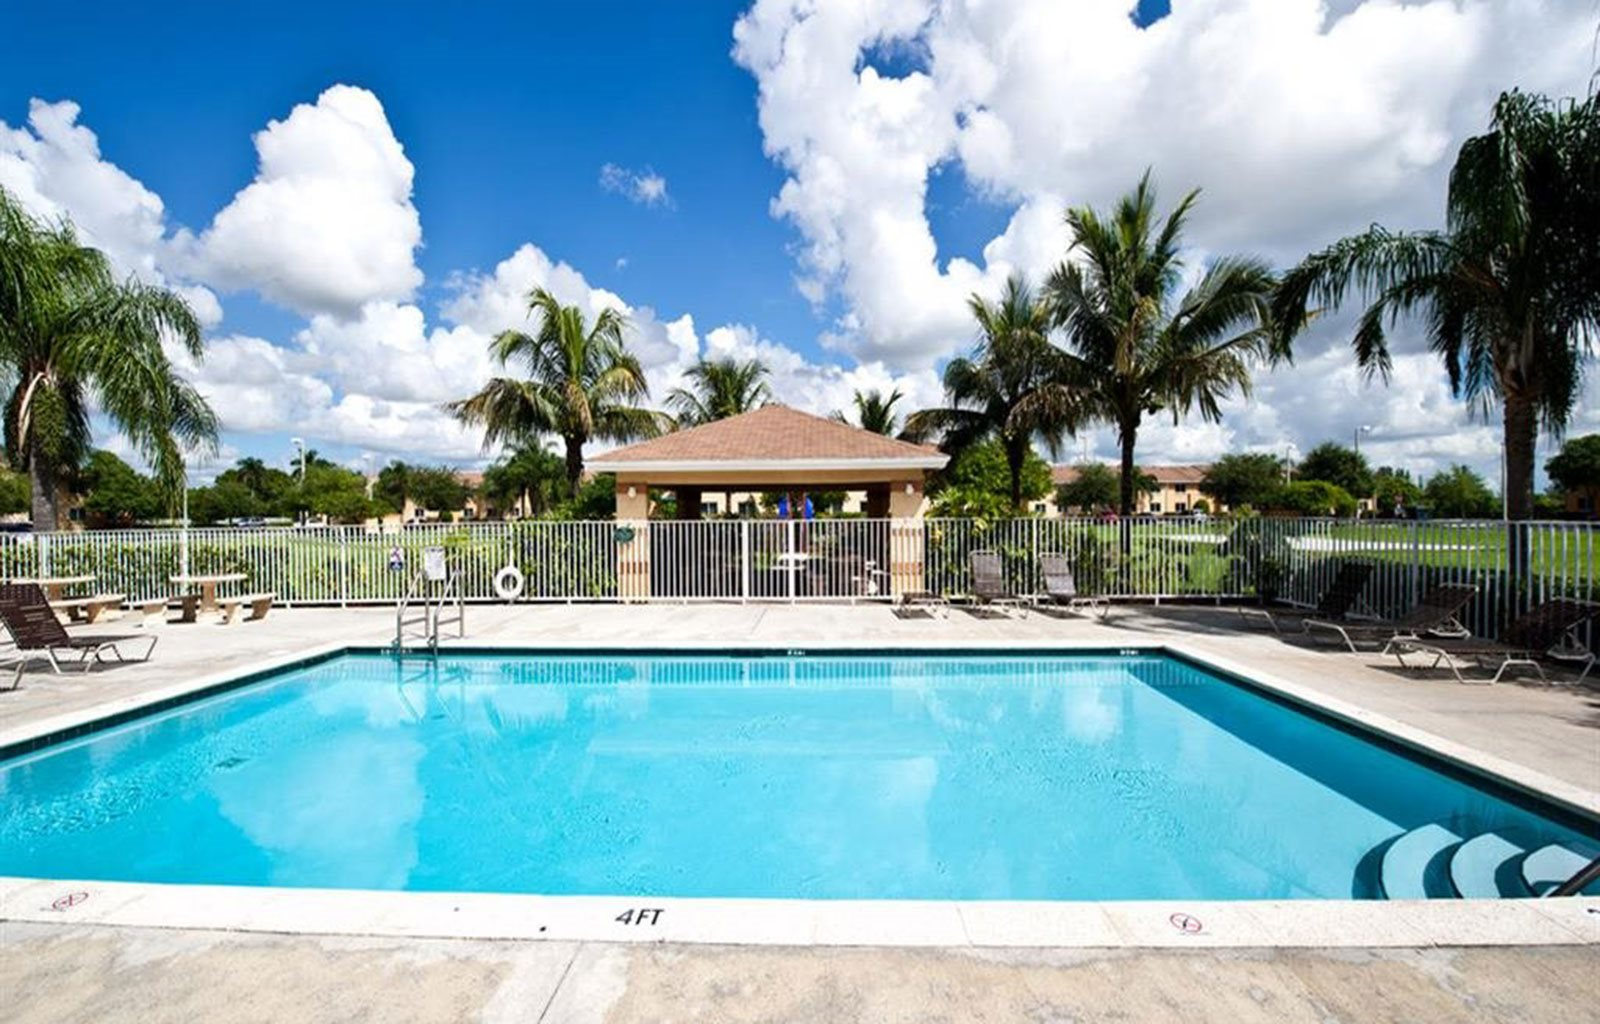 Outdoor swimming pool_Cameron Creek of Florida City, FL